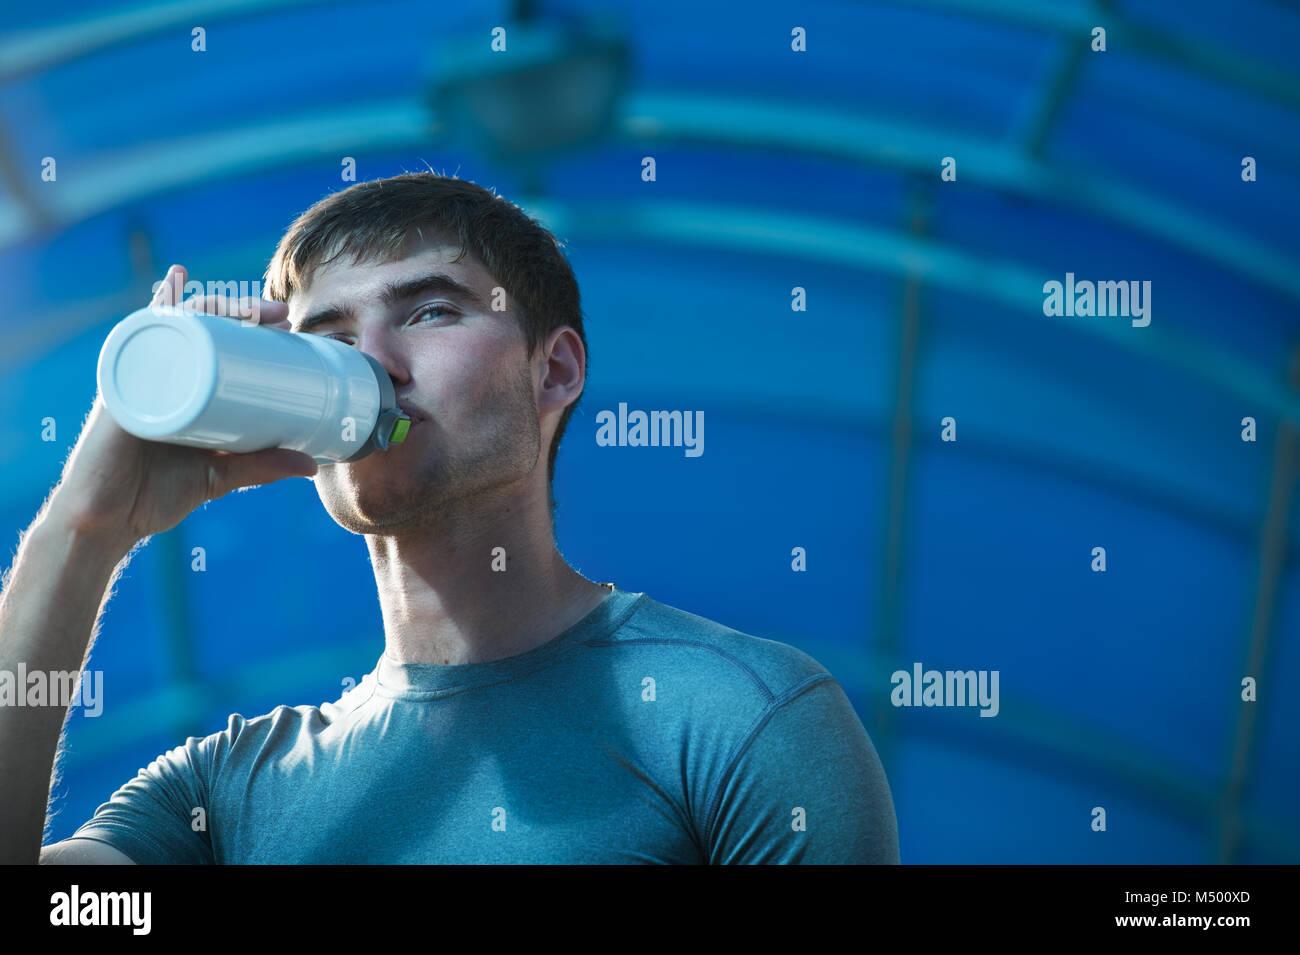 Agua potable joven atlético Imagen De Stock